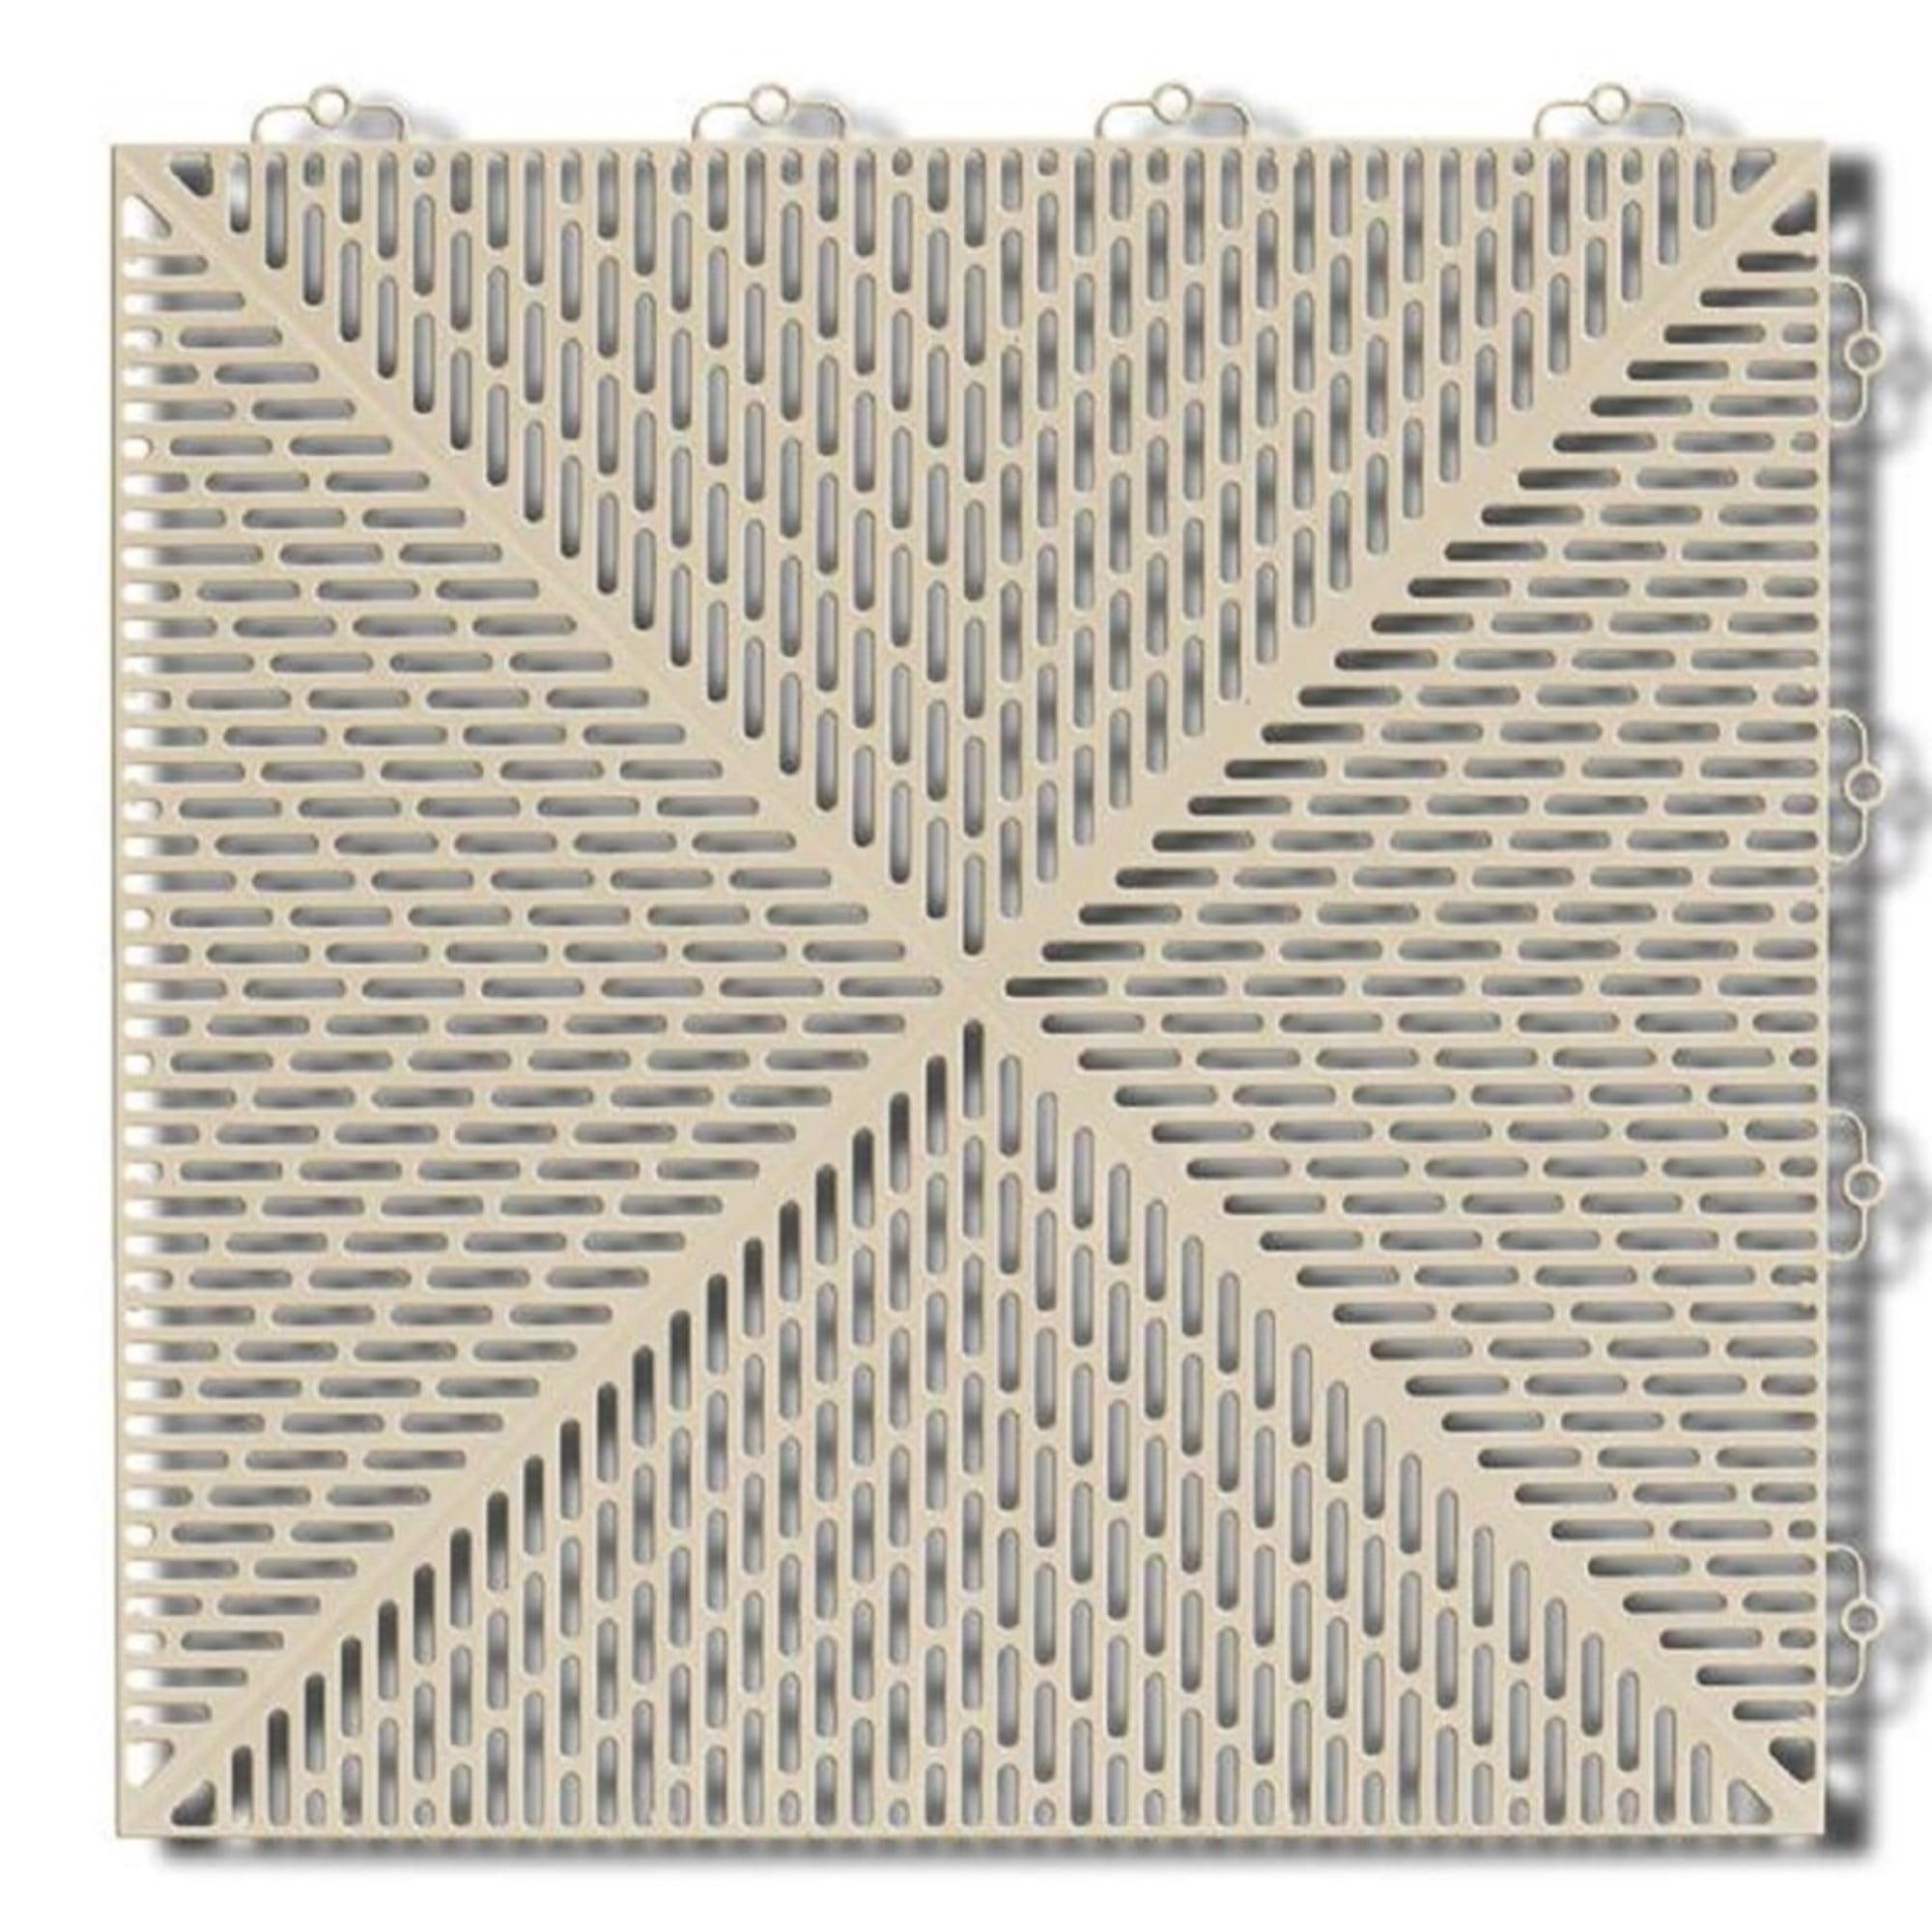 Mats Inc. Bergo Soft Loose Lay Interlocking Wet Area Floor Tiles, Light Blue, 2.46' x 3.69', 6 Pack